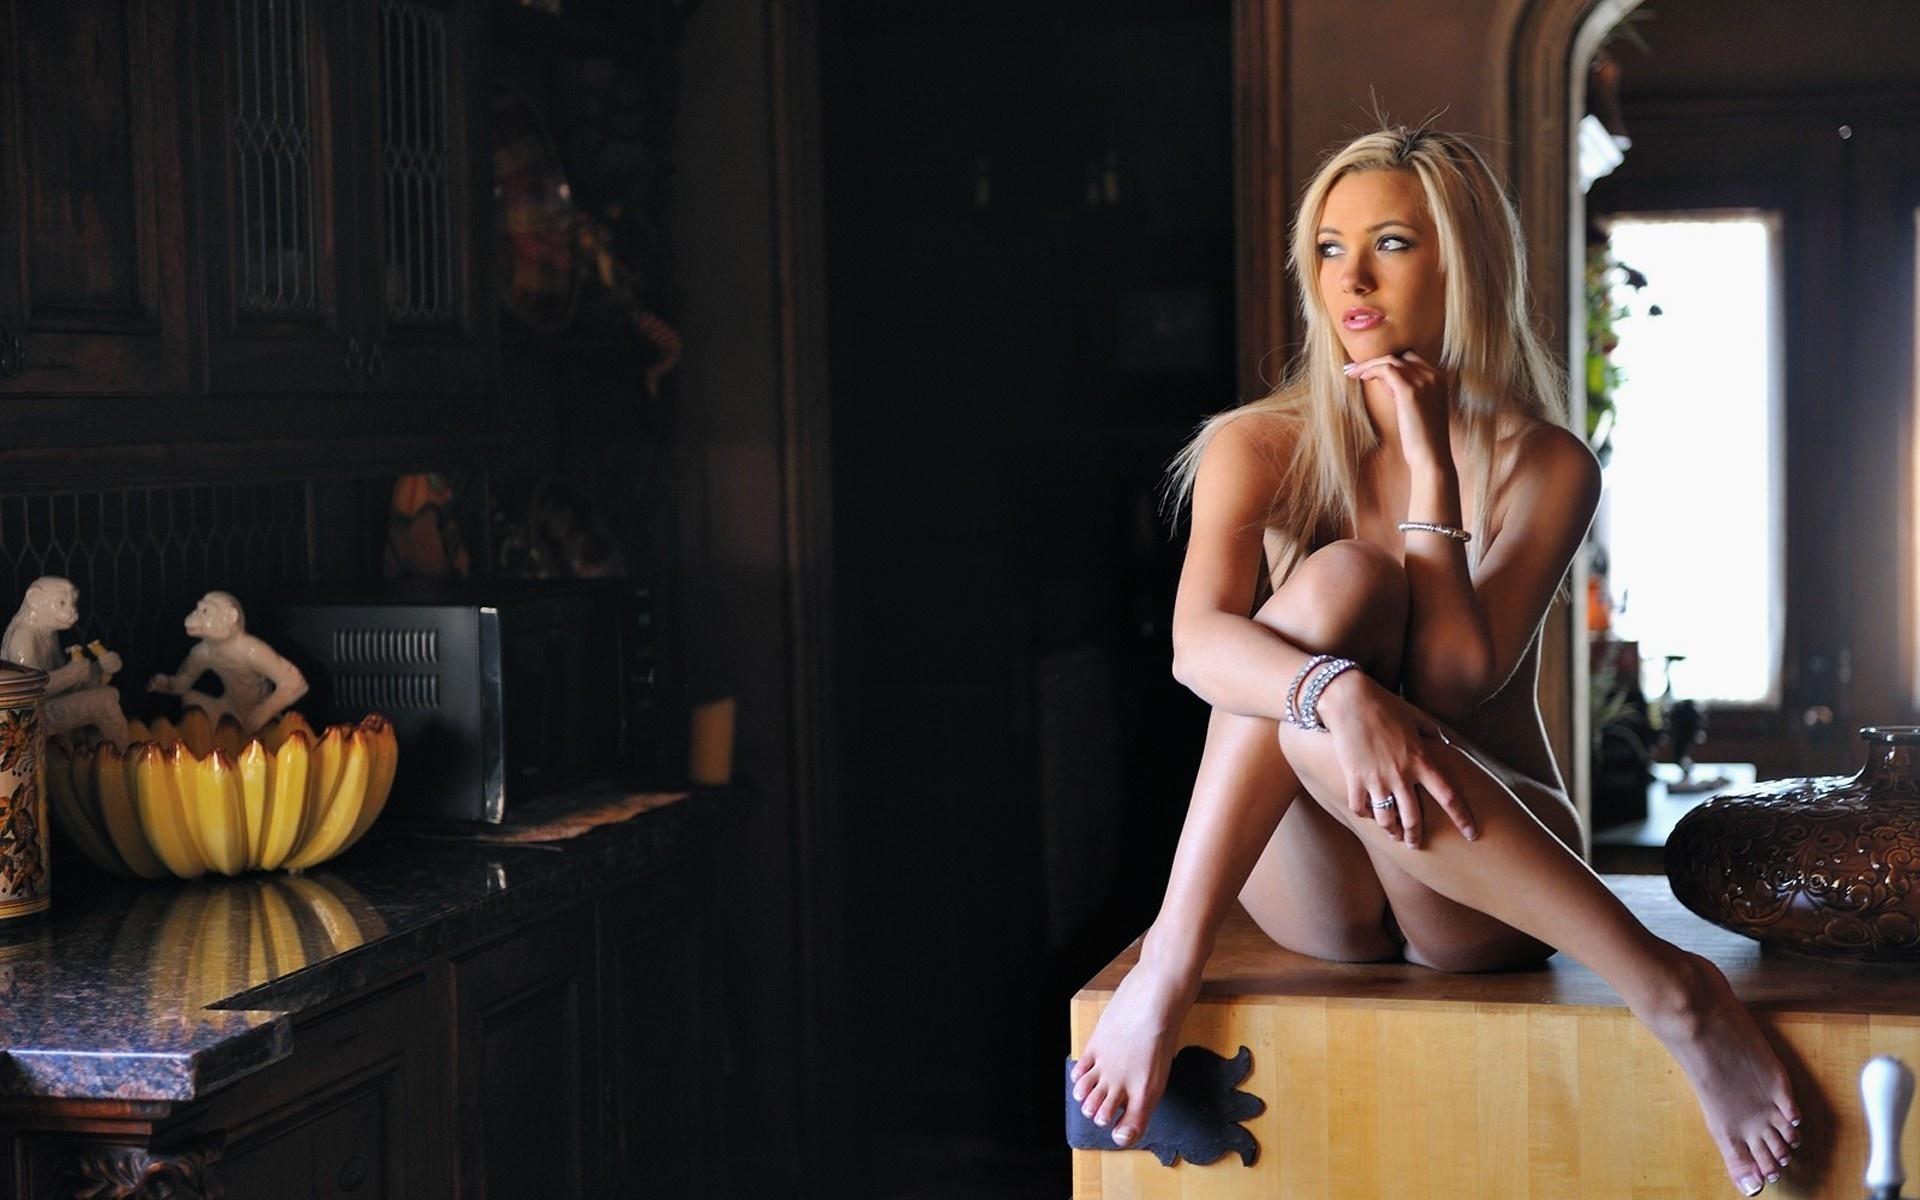 Sophia knight video porno tube